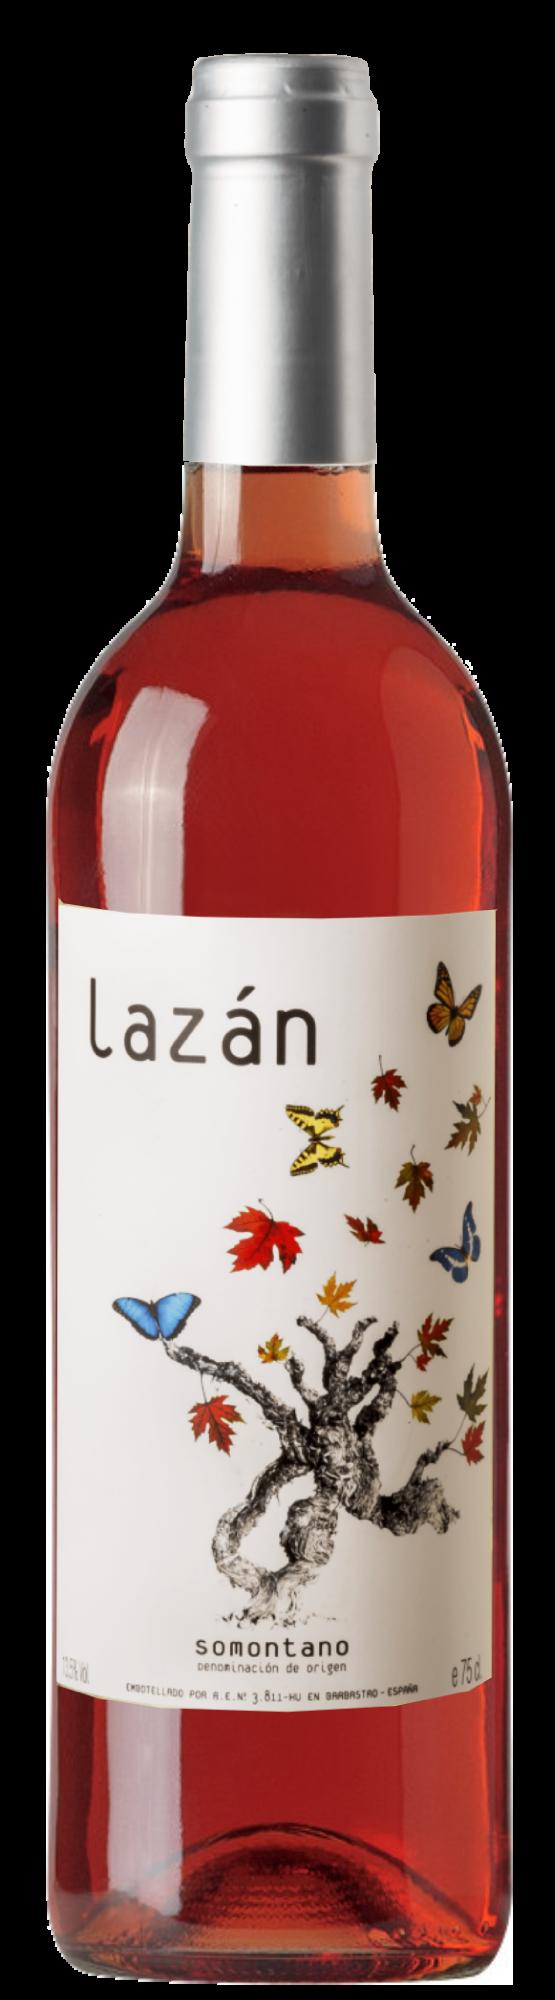 Lazan Rosado склад магазин winewine